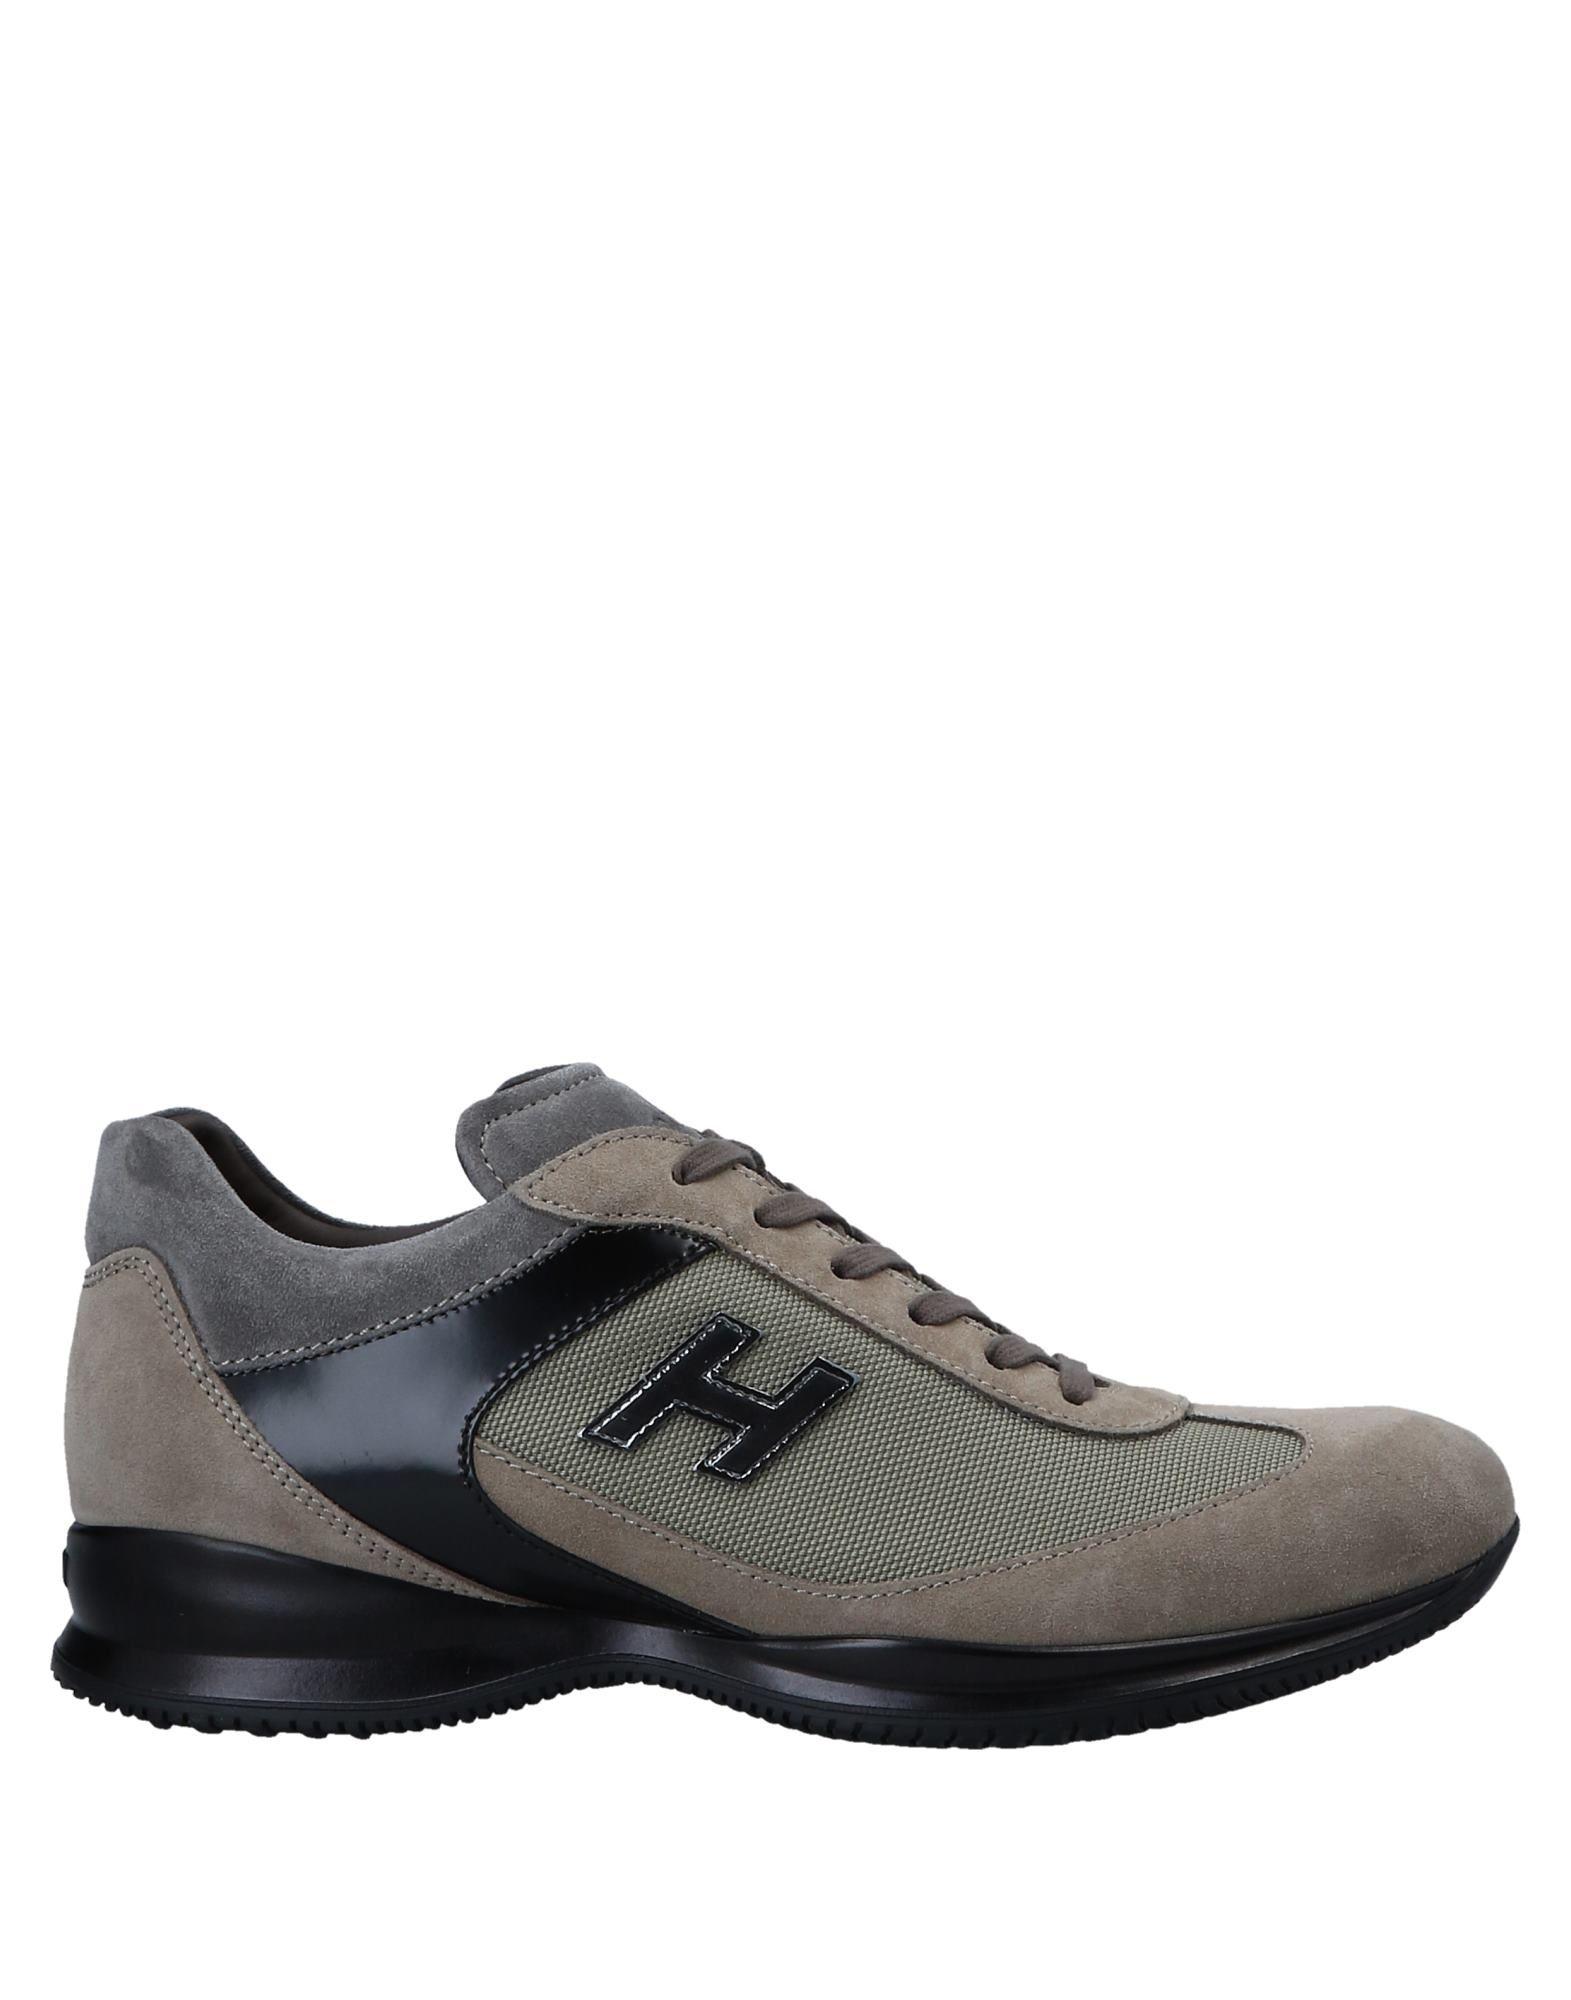 Hogan Sneakers Herren  11560035SV Gute Qualität beliebte Schuhe